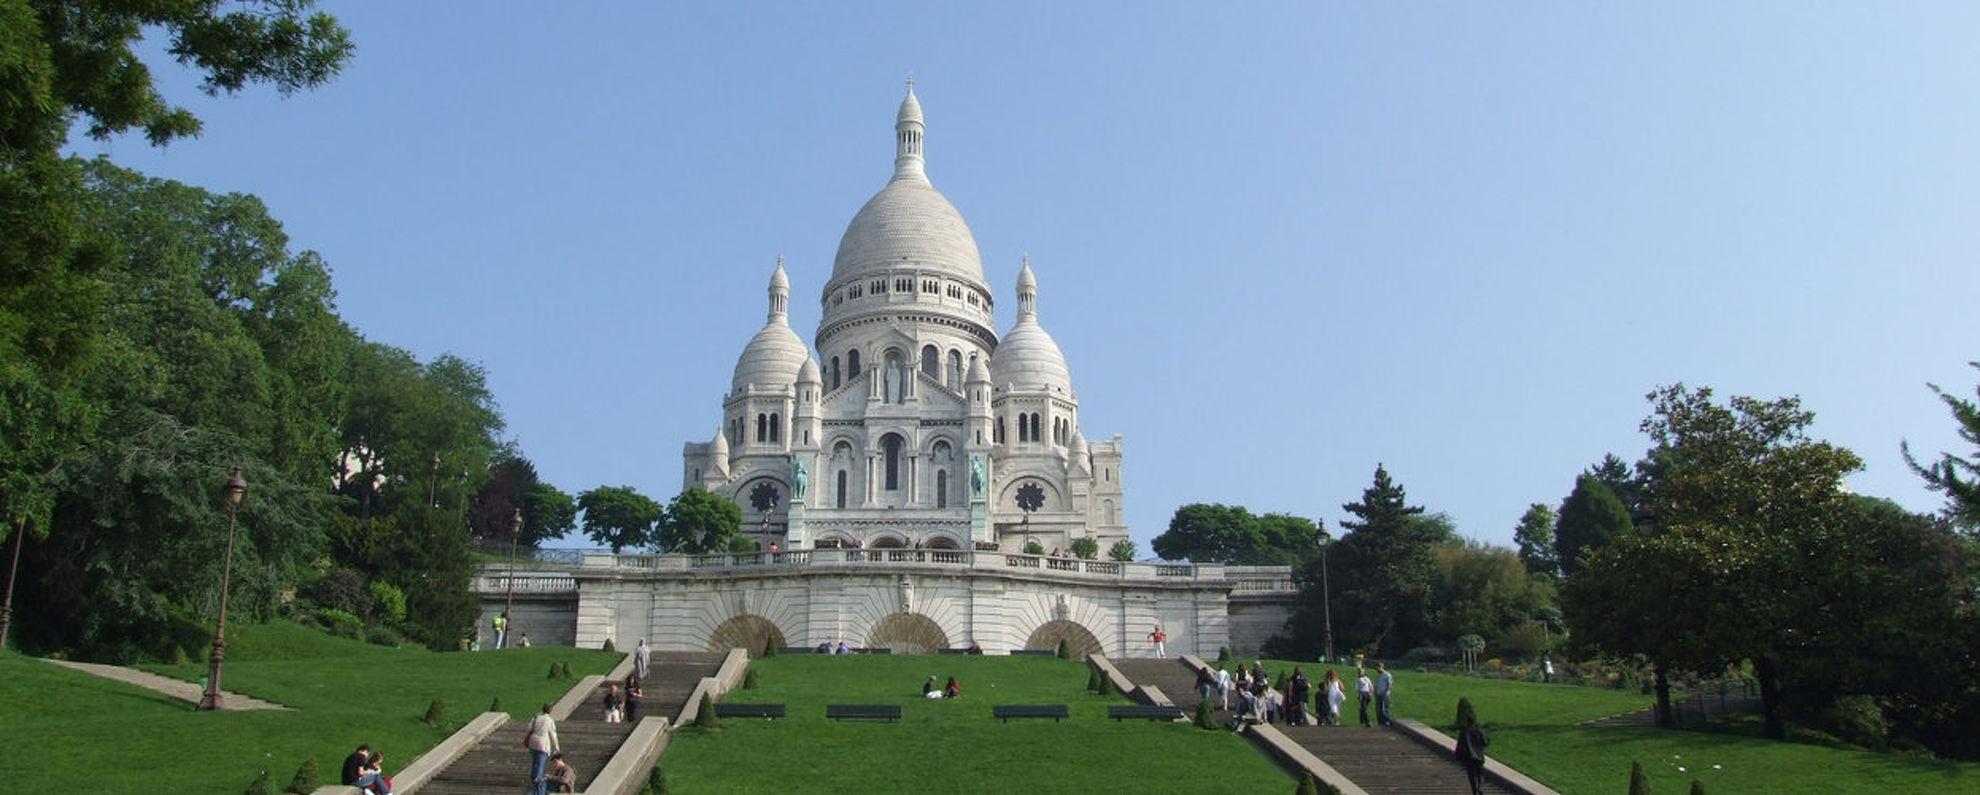 Explore Montmartre